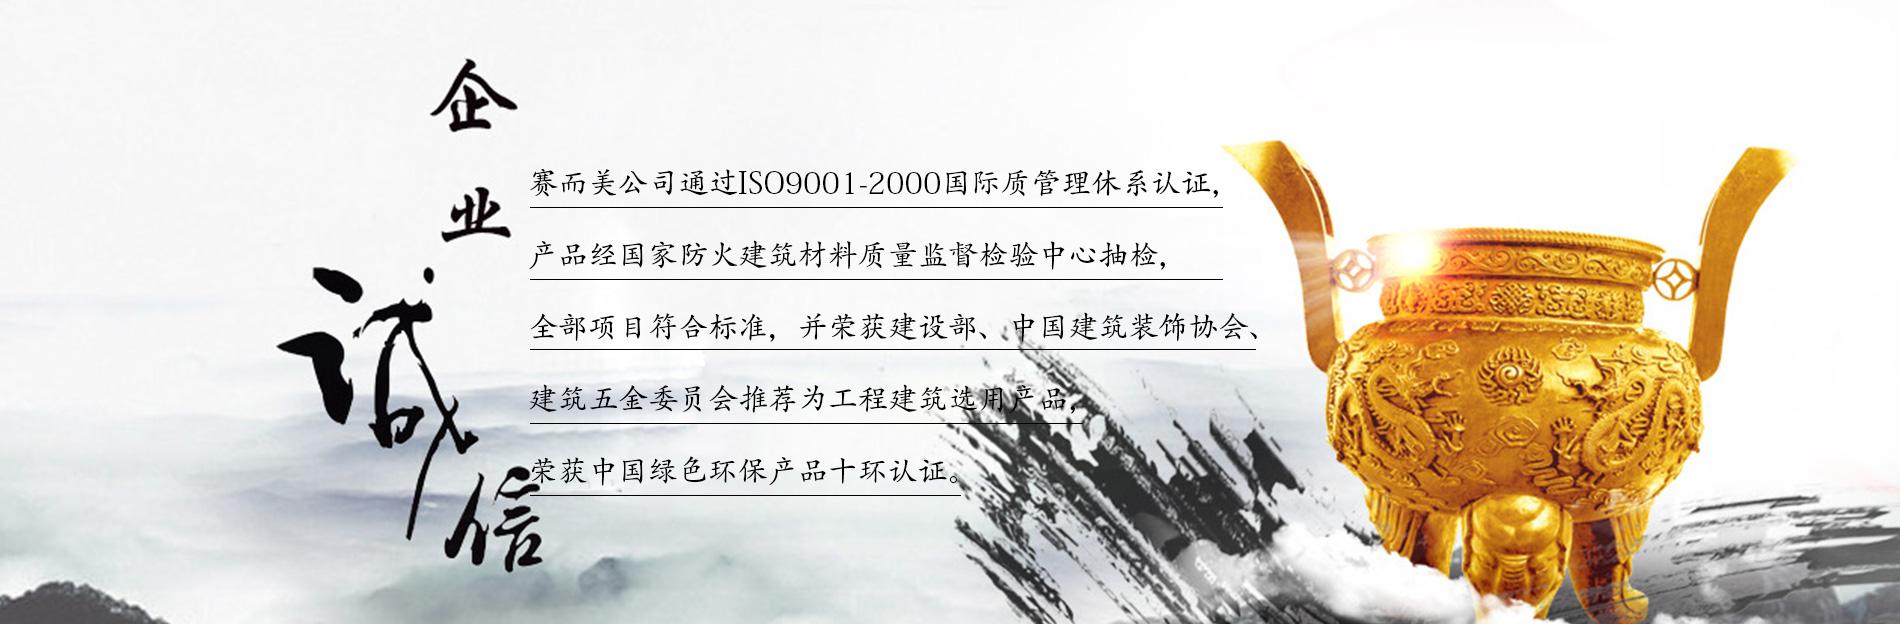 manbetx官网下载铝bet体育万博万博manbetx手机登录